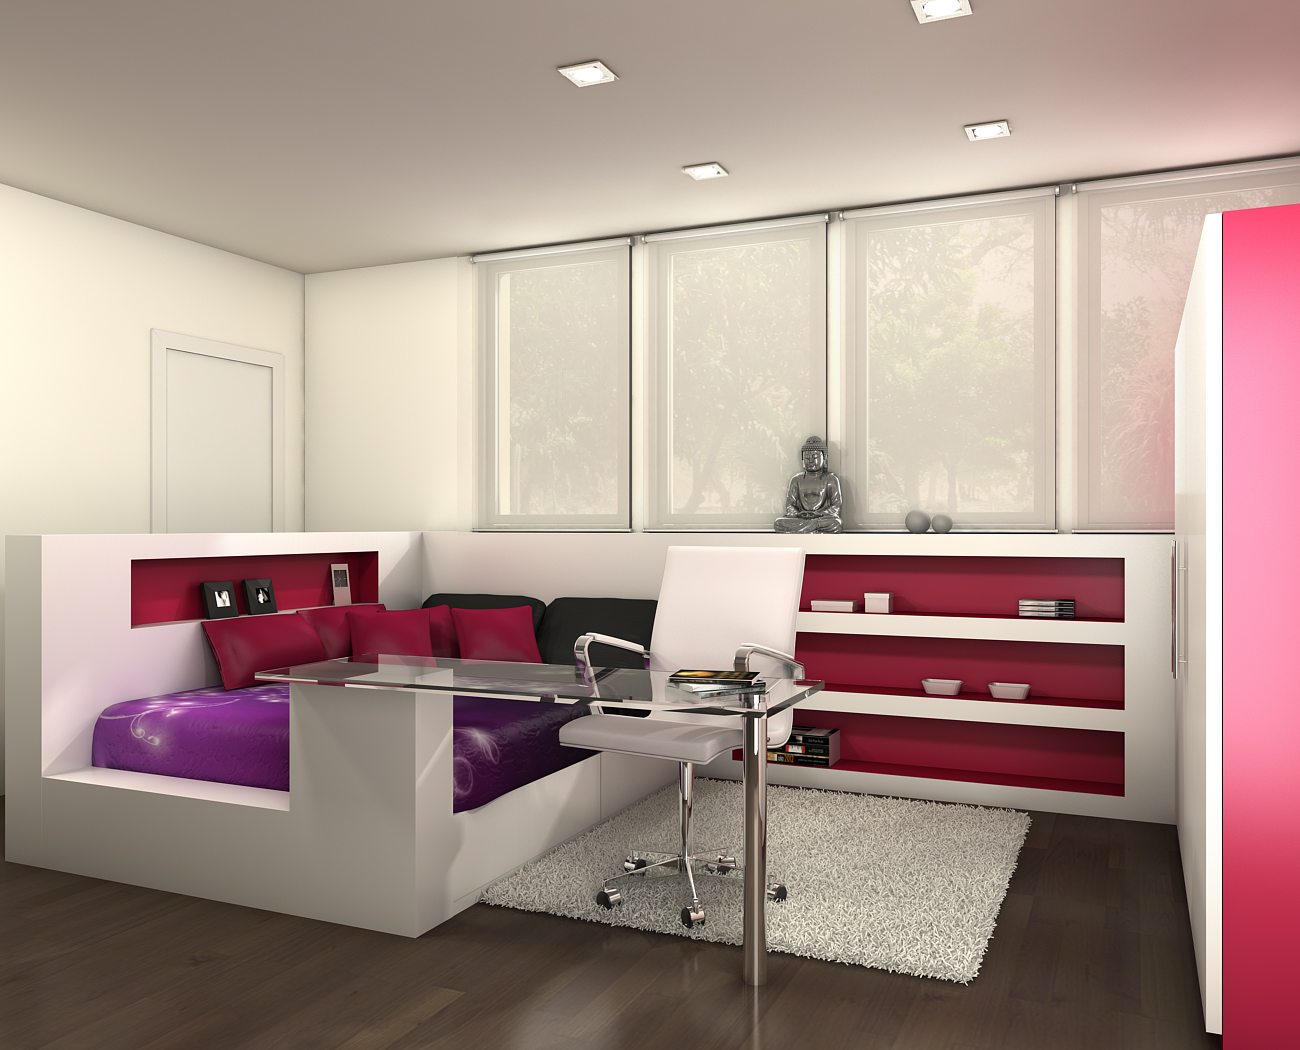 Atrezzo 3d habitaciones juveniles - Habitaciones modulares juveniles ...